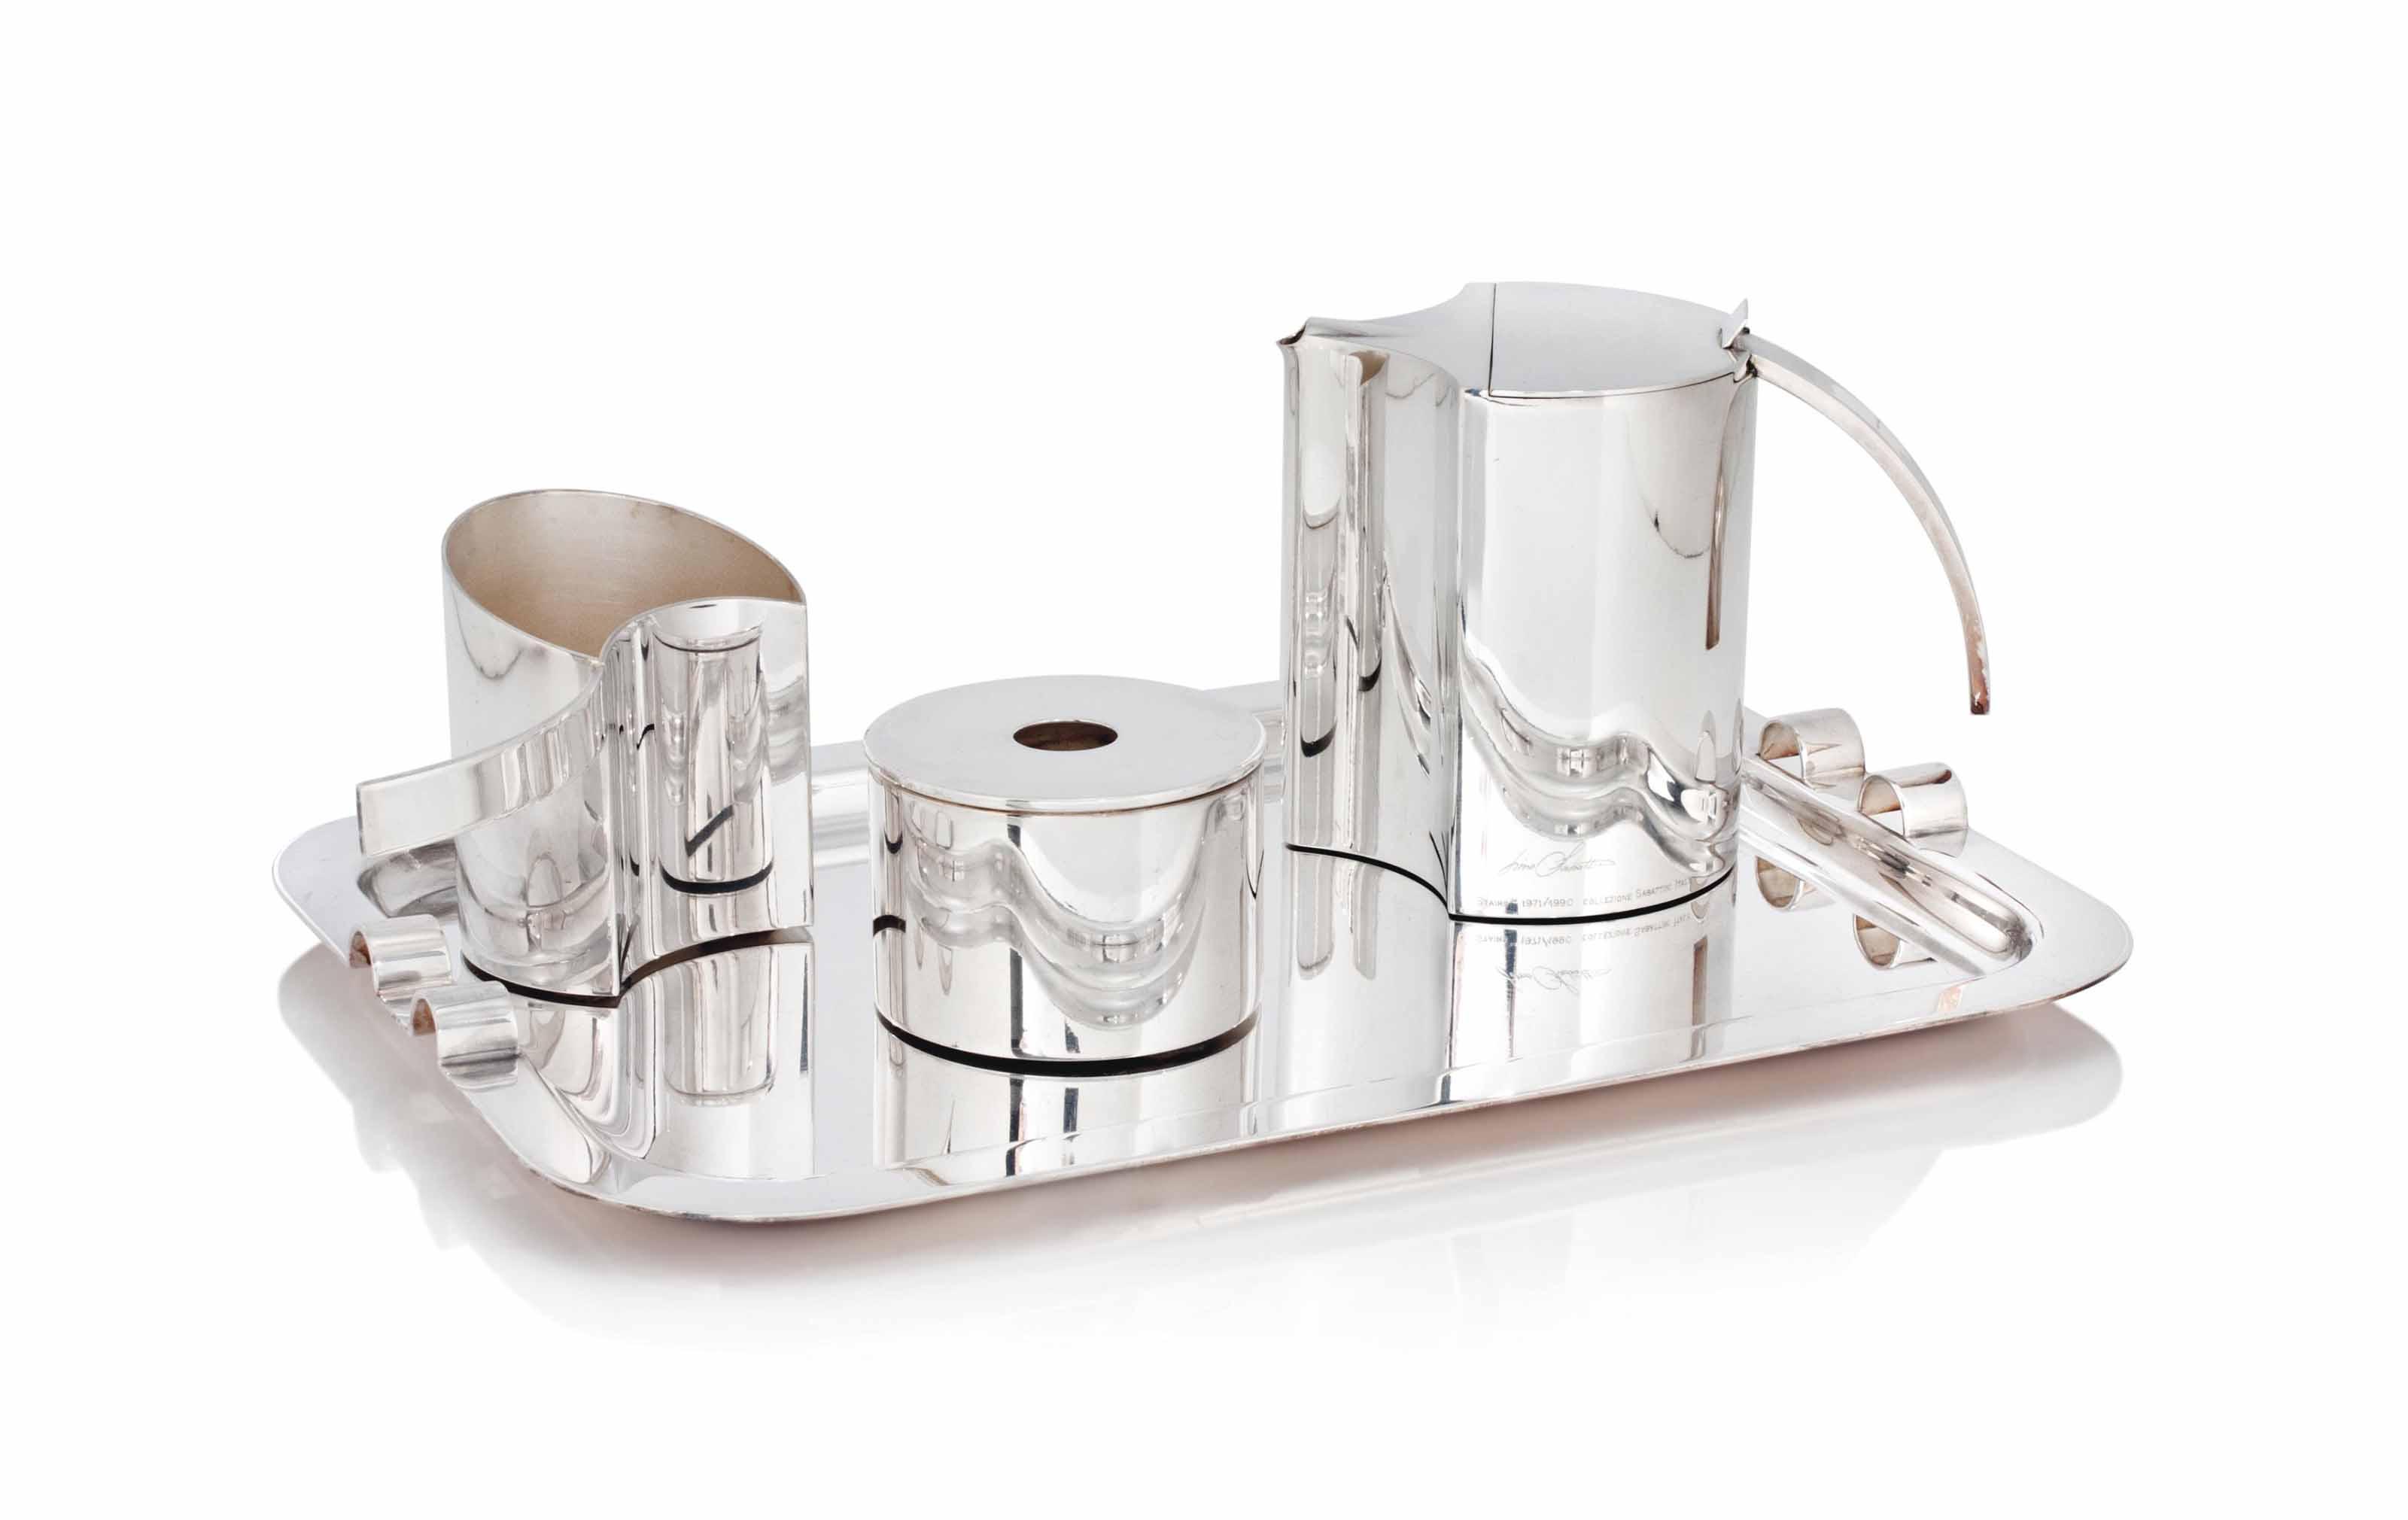 A LINO SABATTINI (B.1925) SILVER PLATED 'STAIRS' TEA/COFFEE SET